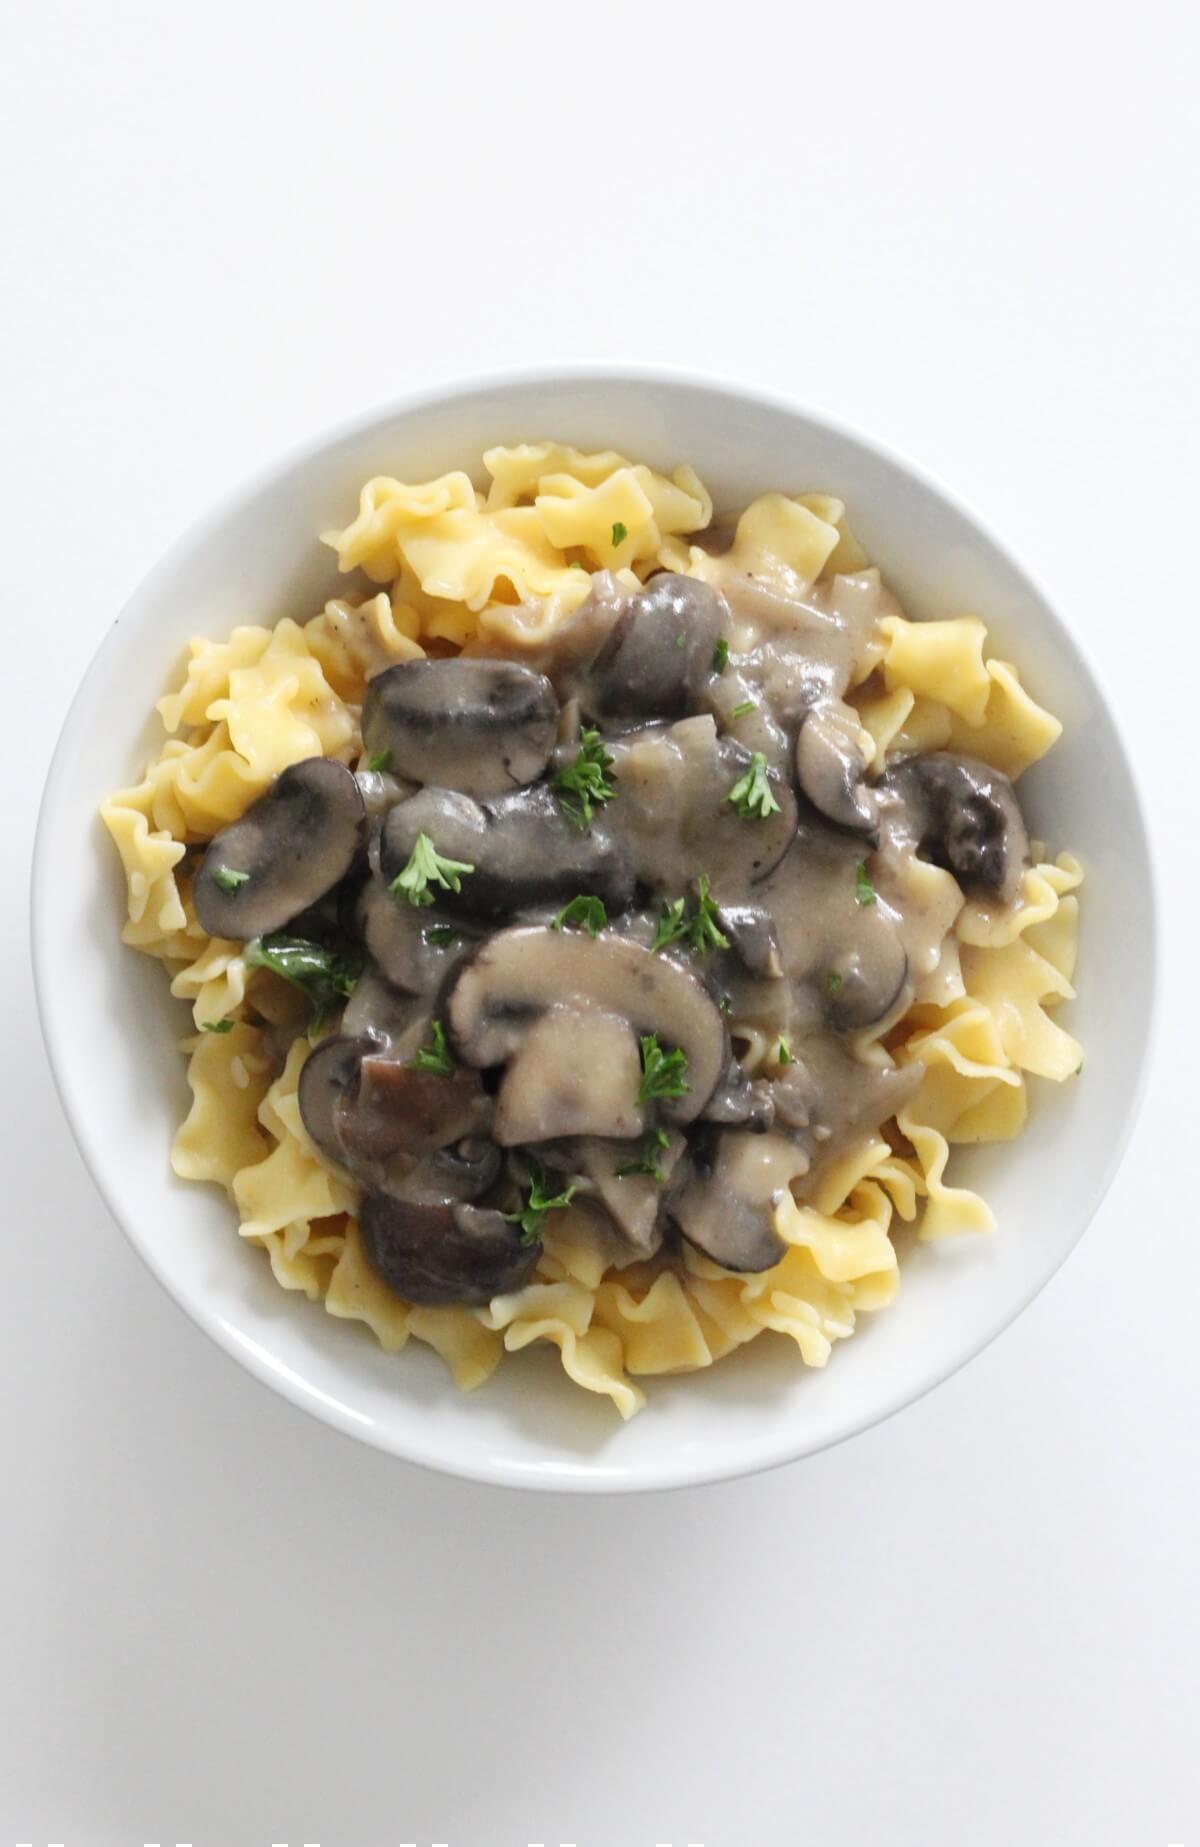 overhead view of vegan mushroom stroganoff over gluten-free noodles in bowl